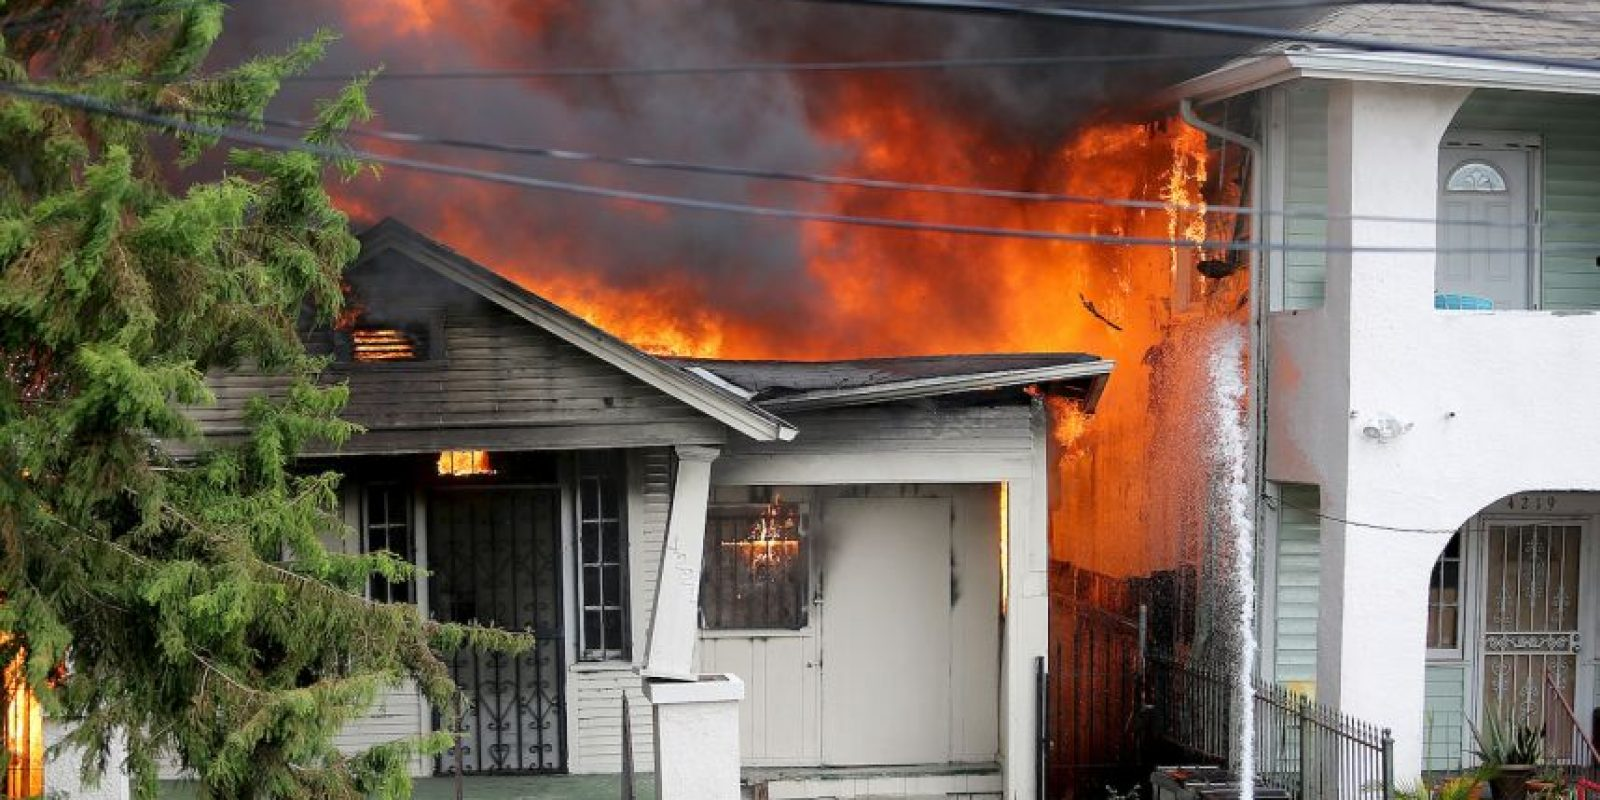 AP Foto:No obedeció las instrucciones de los bomberos